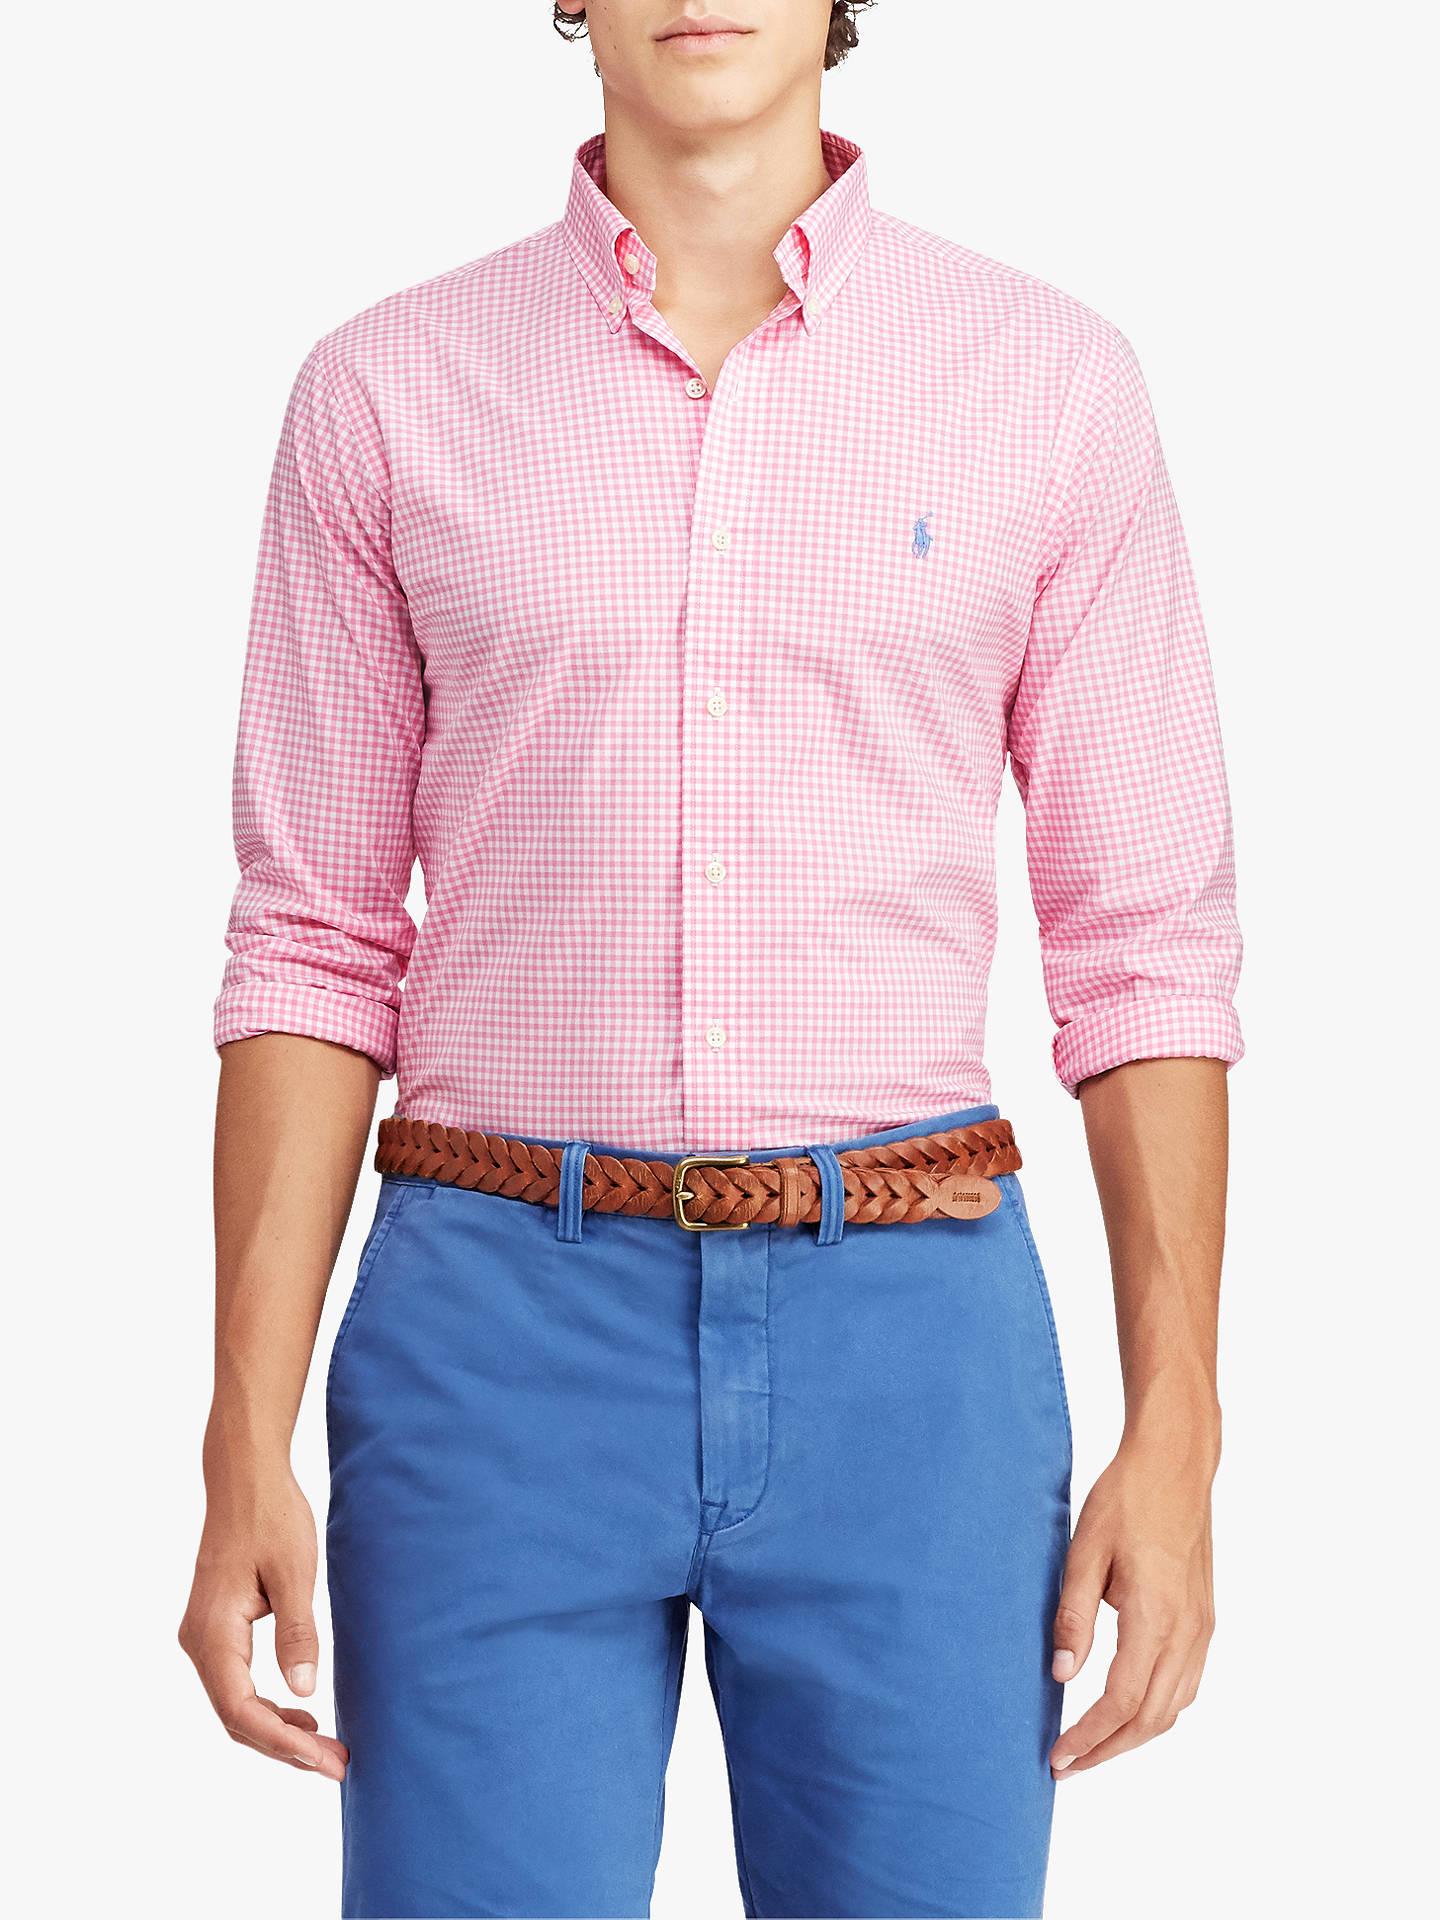 6d7cc08e Polo Ralph Lauren Classic Fit Gingham Shirt, Pink/White at John ...